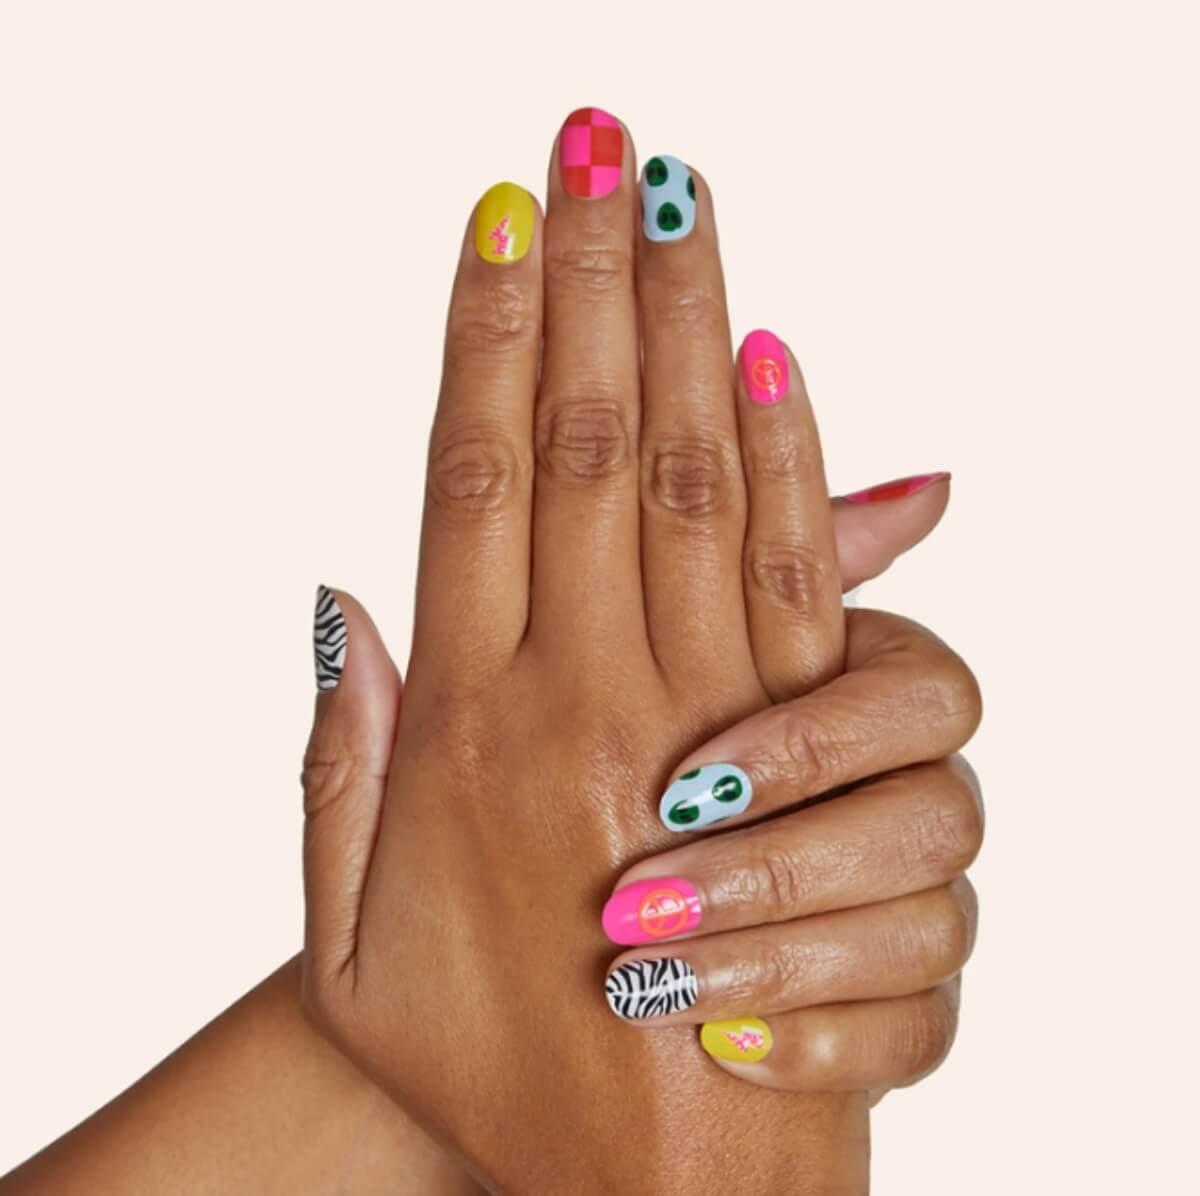 manime-press-on-nails-081321